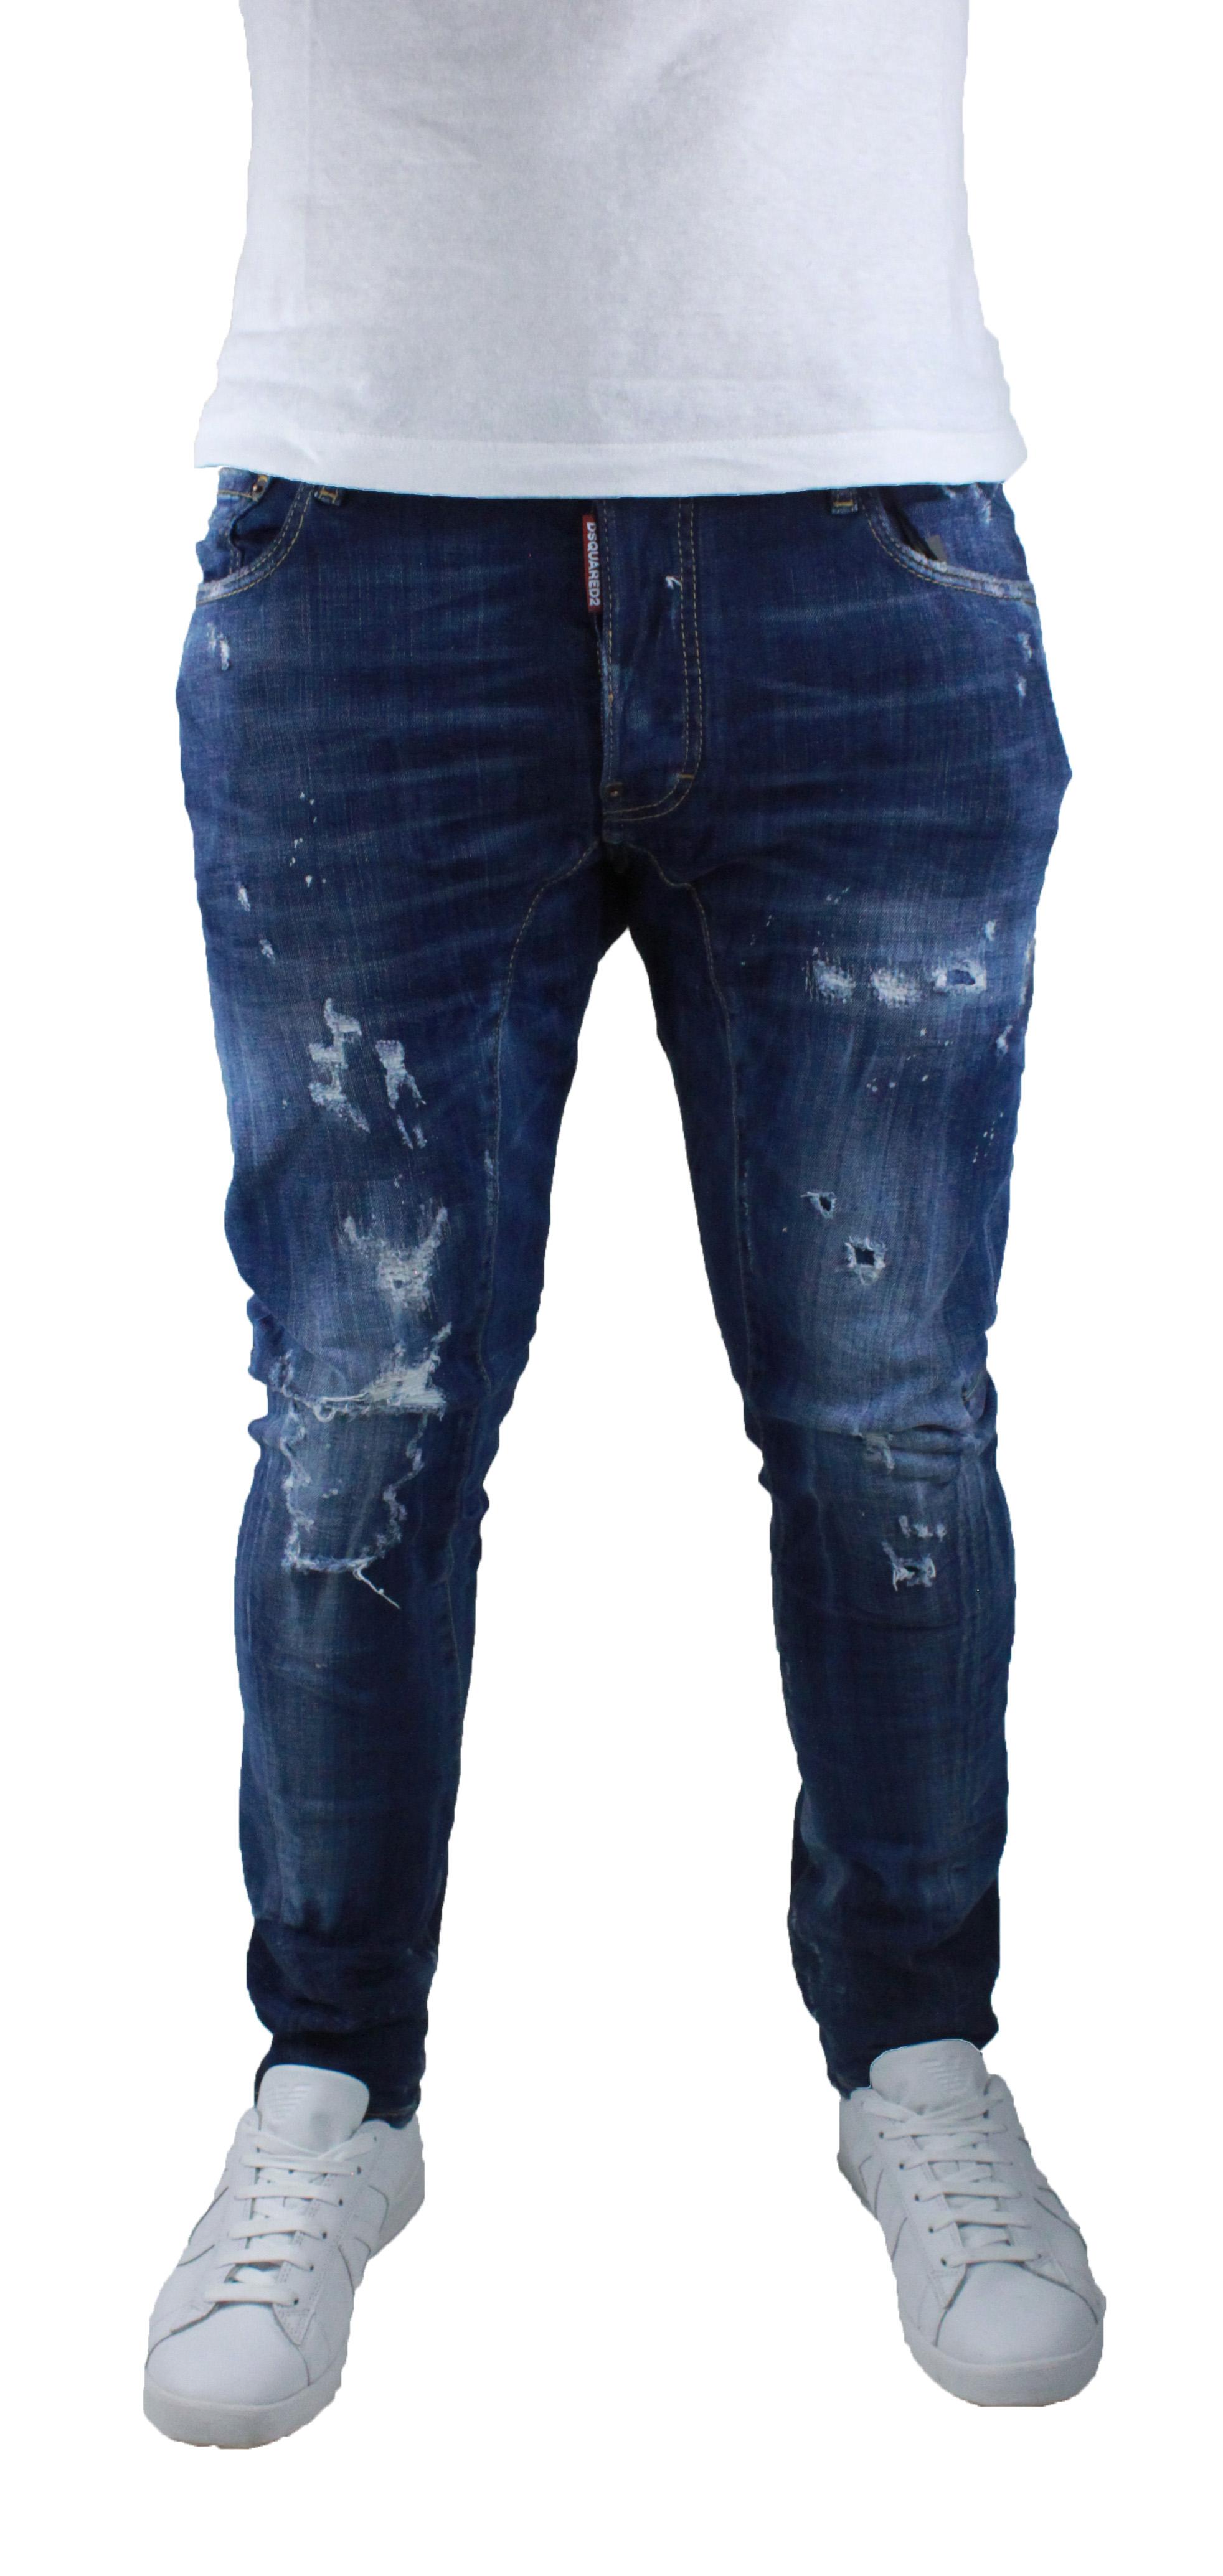 91ca512873685 DSquared2 Tidy Biker S71LB0266 S30342 470 Jeans   eBay